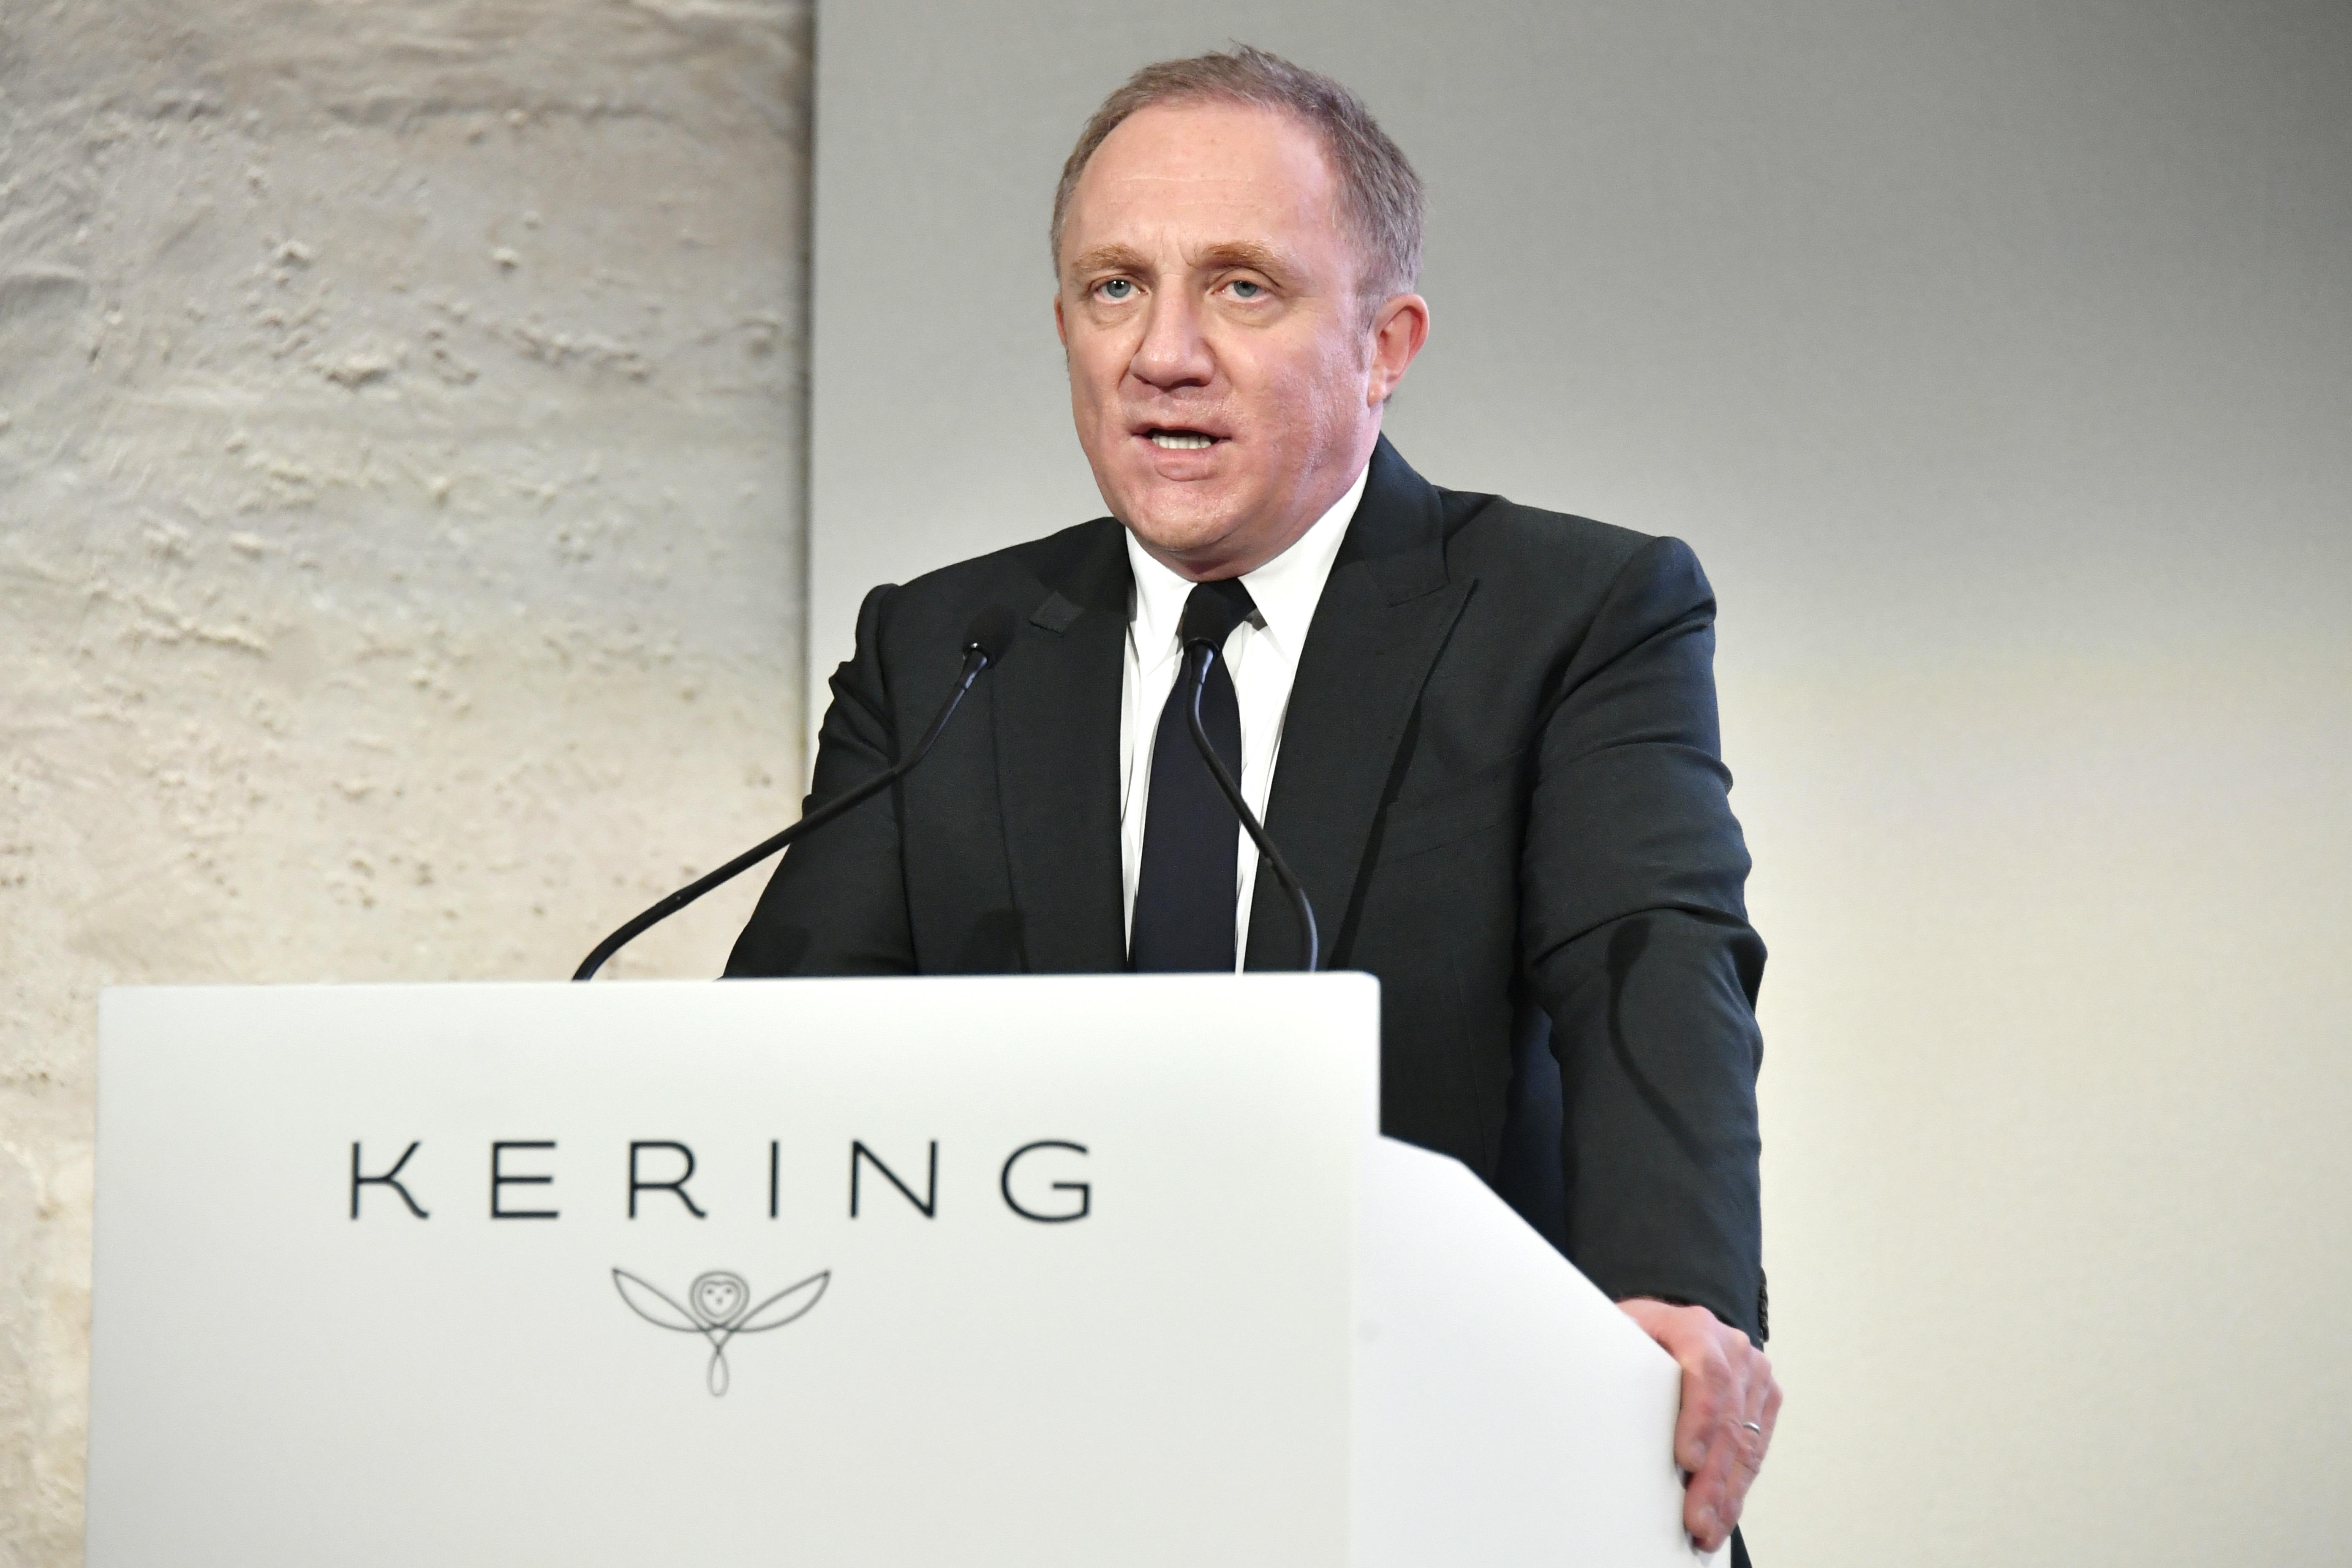 François-Henri Pinault at the Kering press conference